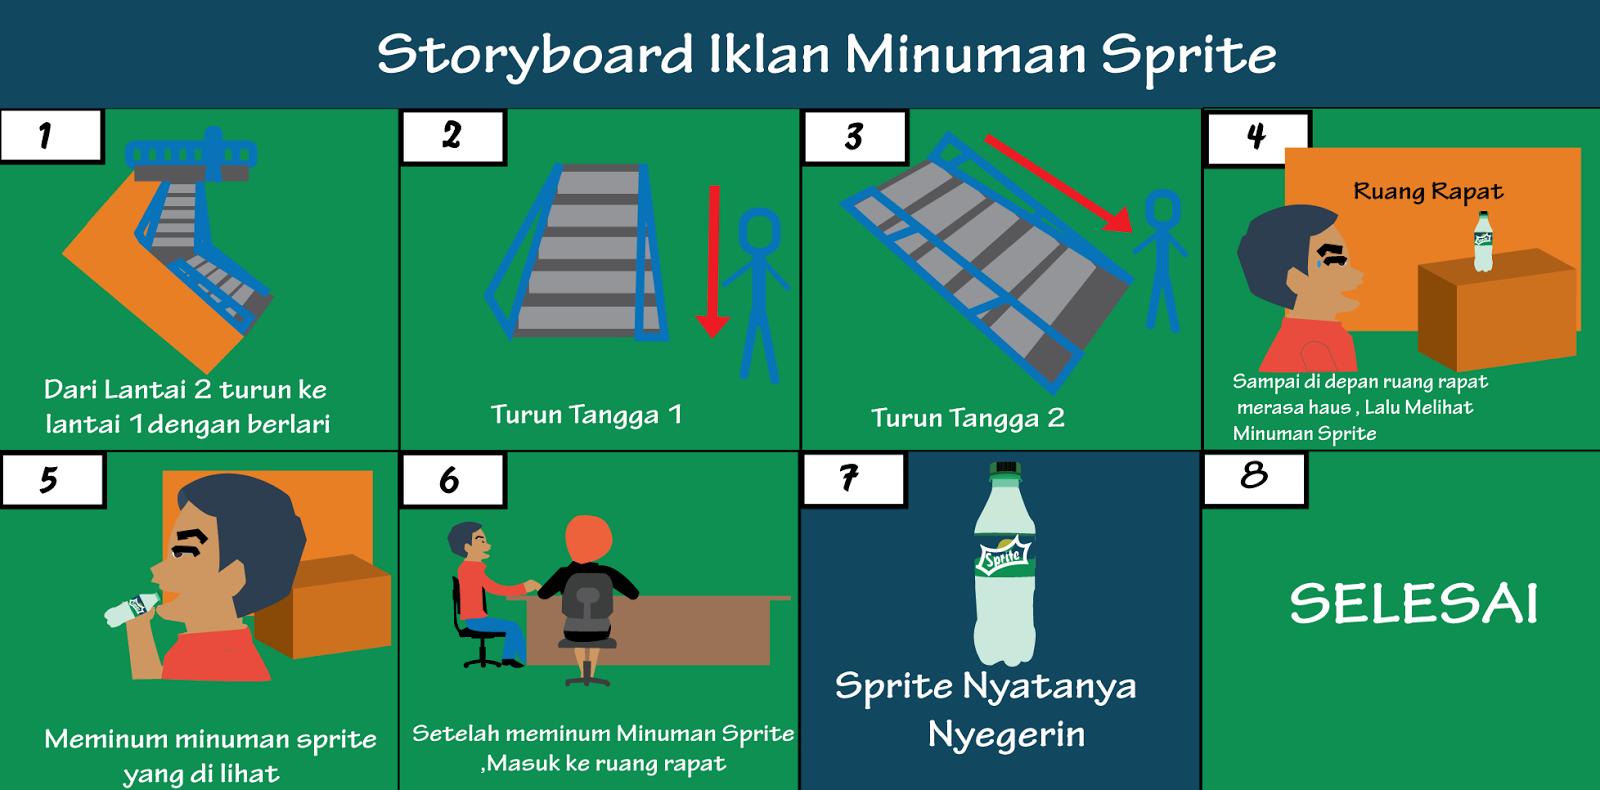 Contoh Storyboard Iklan Minuman Mizone